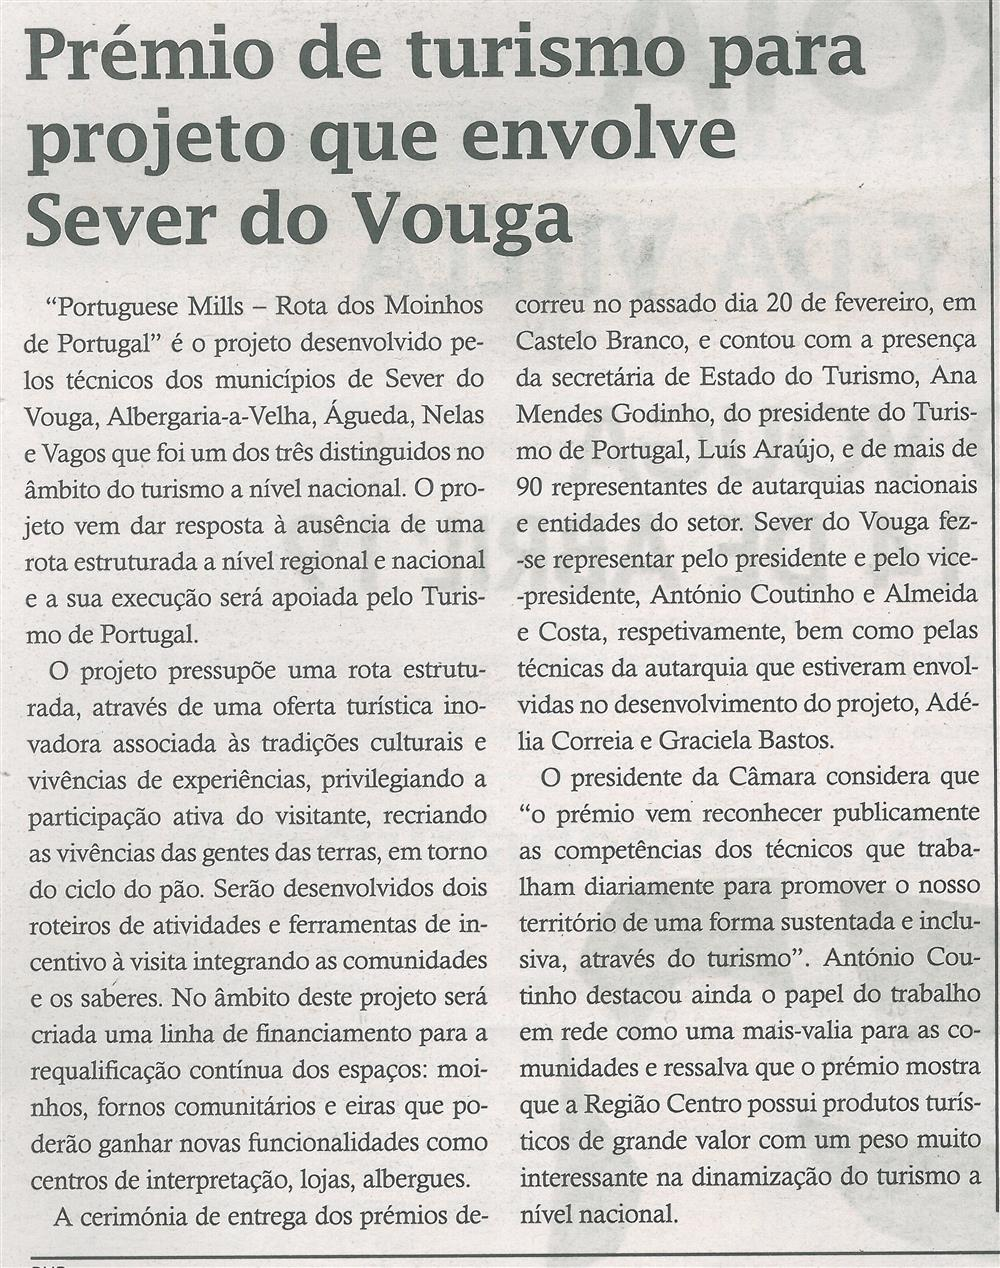 Prémio de turismo para projeto que envolve Sever do Vouga.jpg